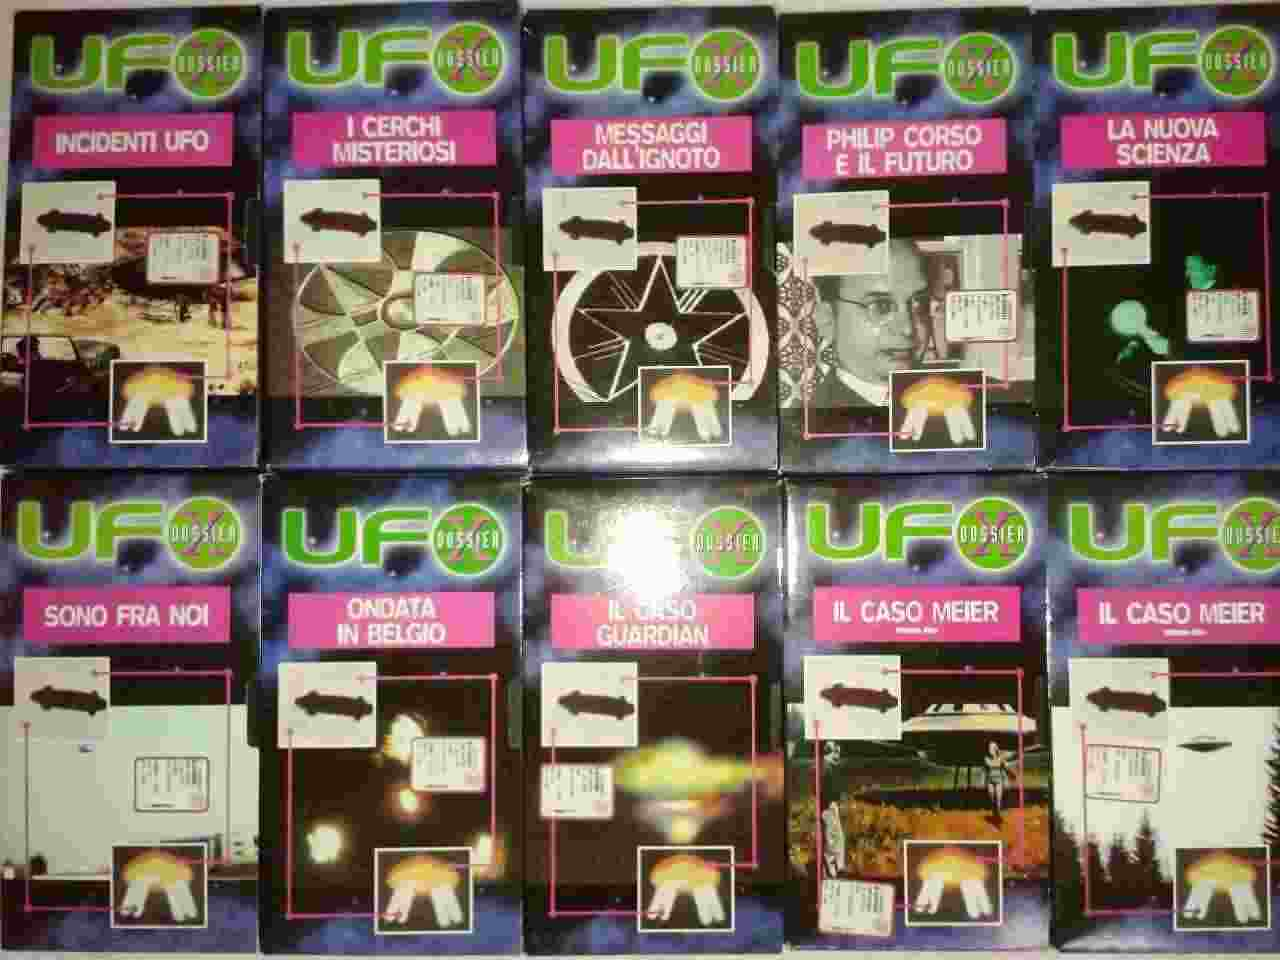 Ufo e alieni, UFO Dossier X, vari volumi in Vhs. Lista 3